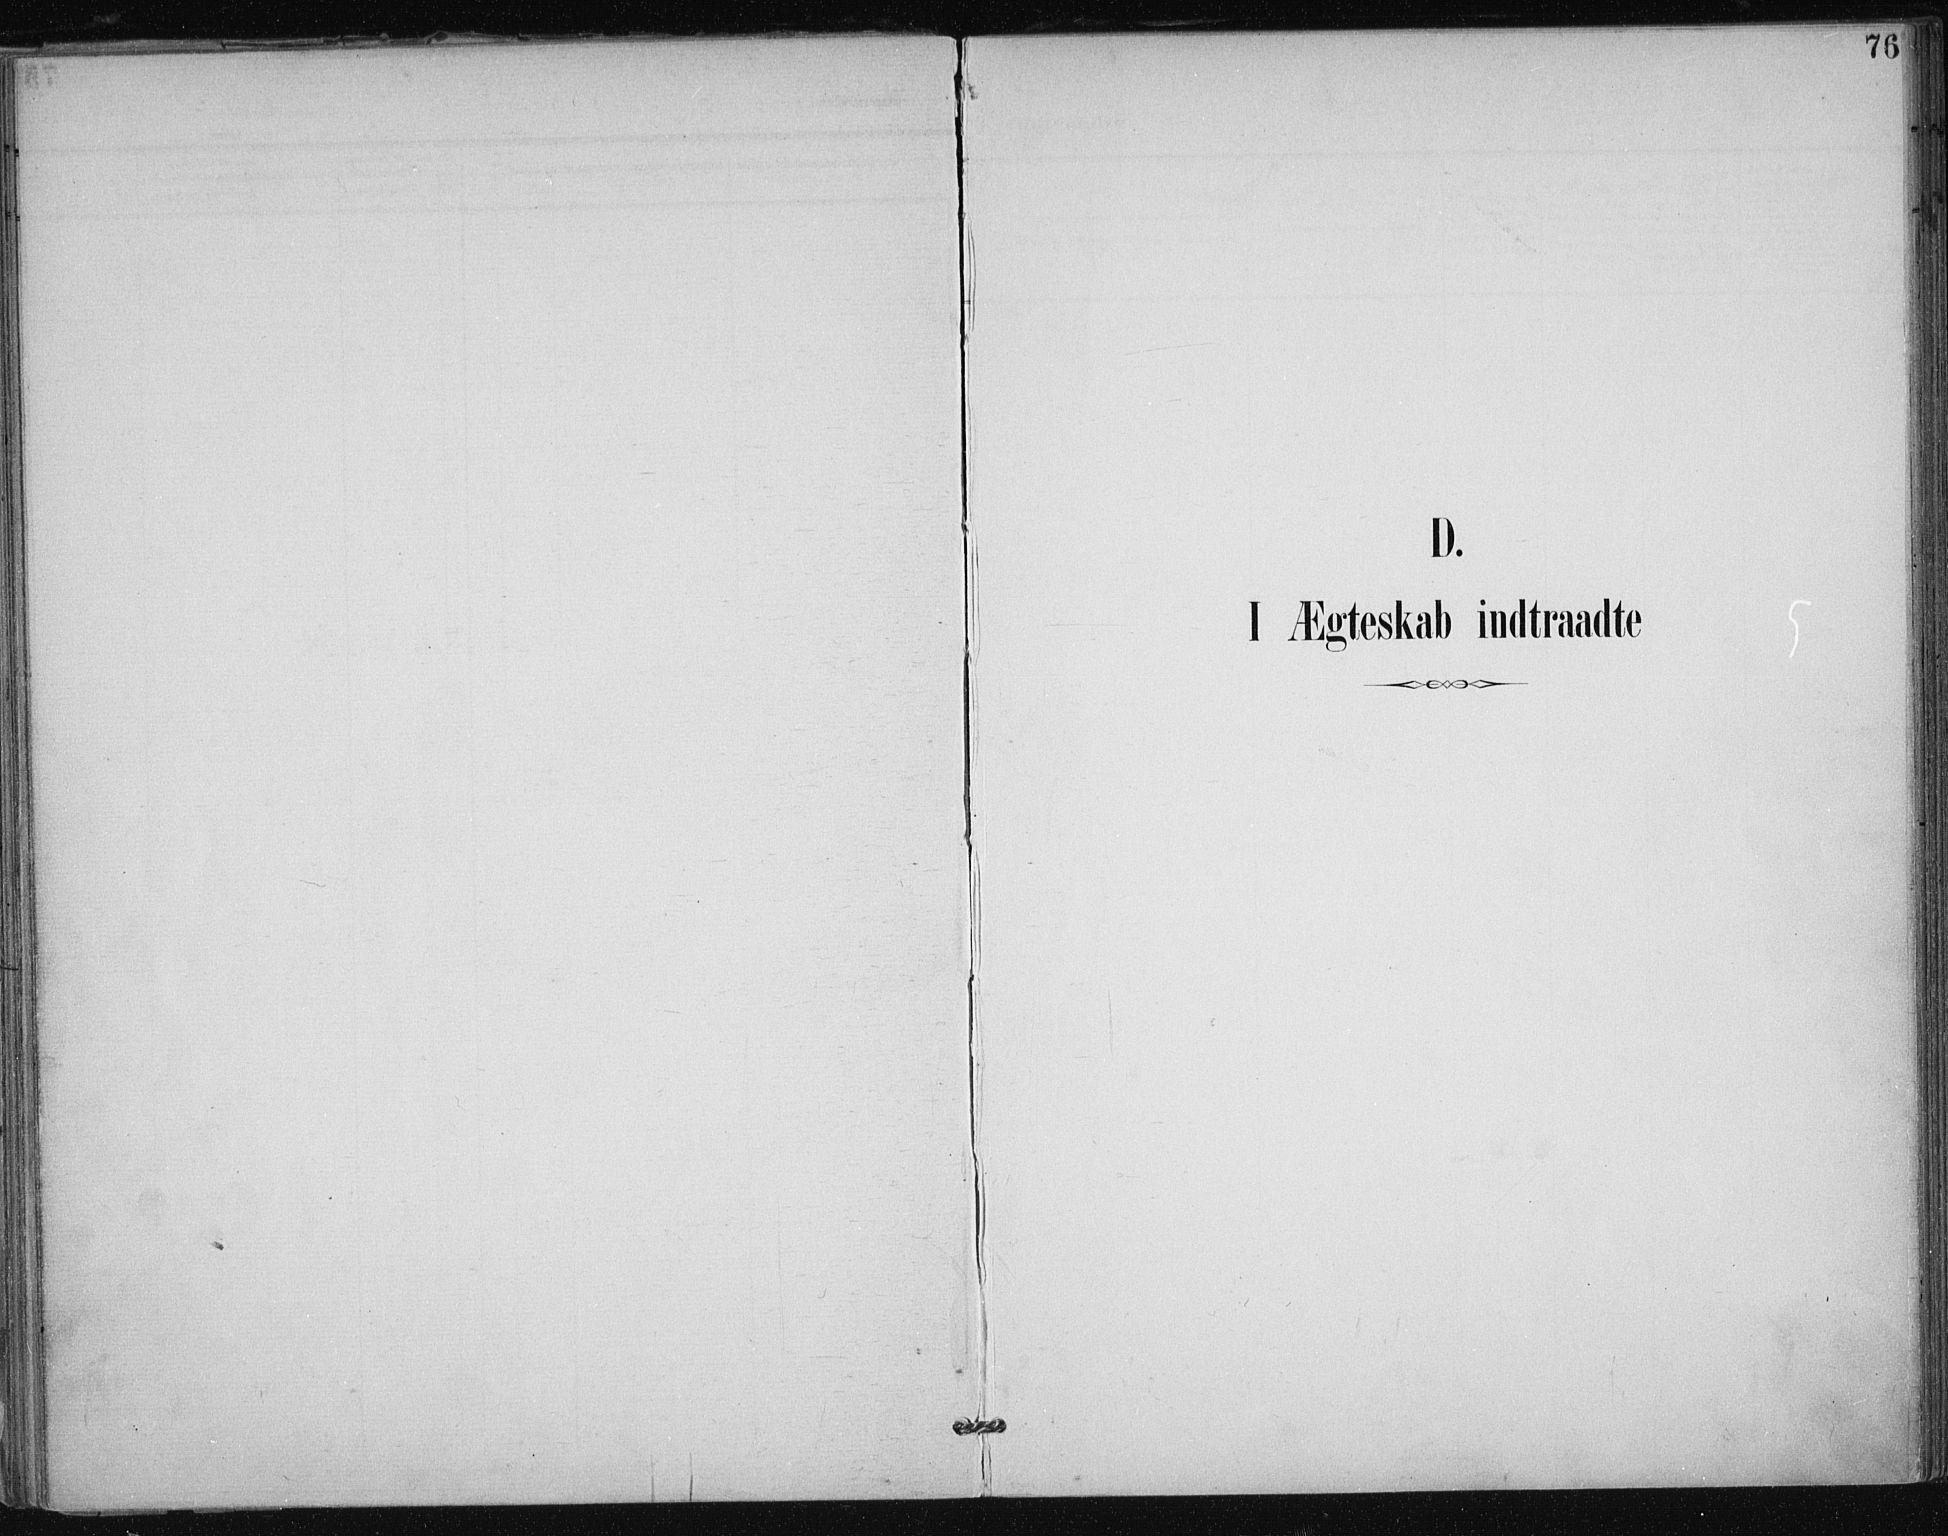 SAT, Ministerialprotokoller, klokkerbøker og fødselsregistre - Sør-Trøndelag, 612/L0380: Parish register (official) no. 612A12, 1898-1907, p. 76